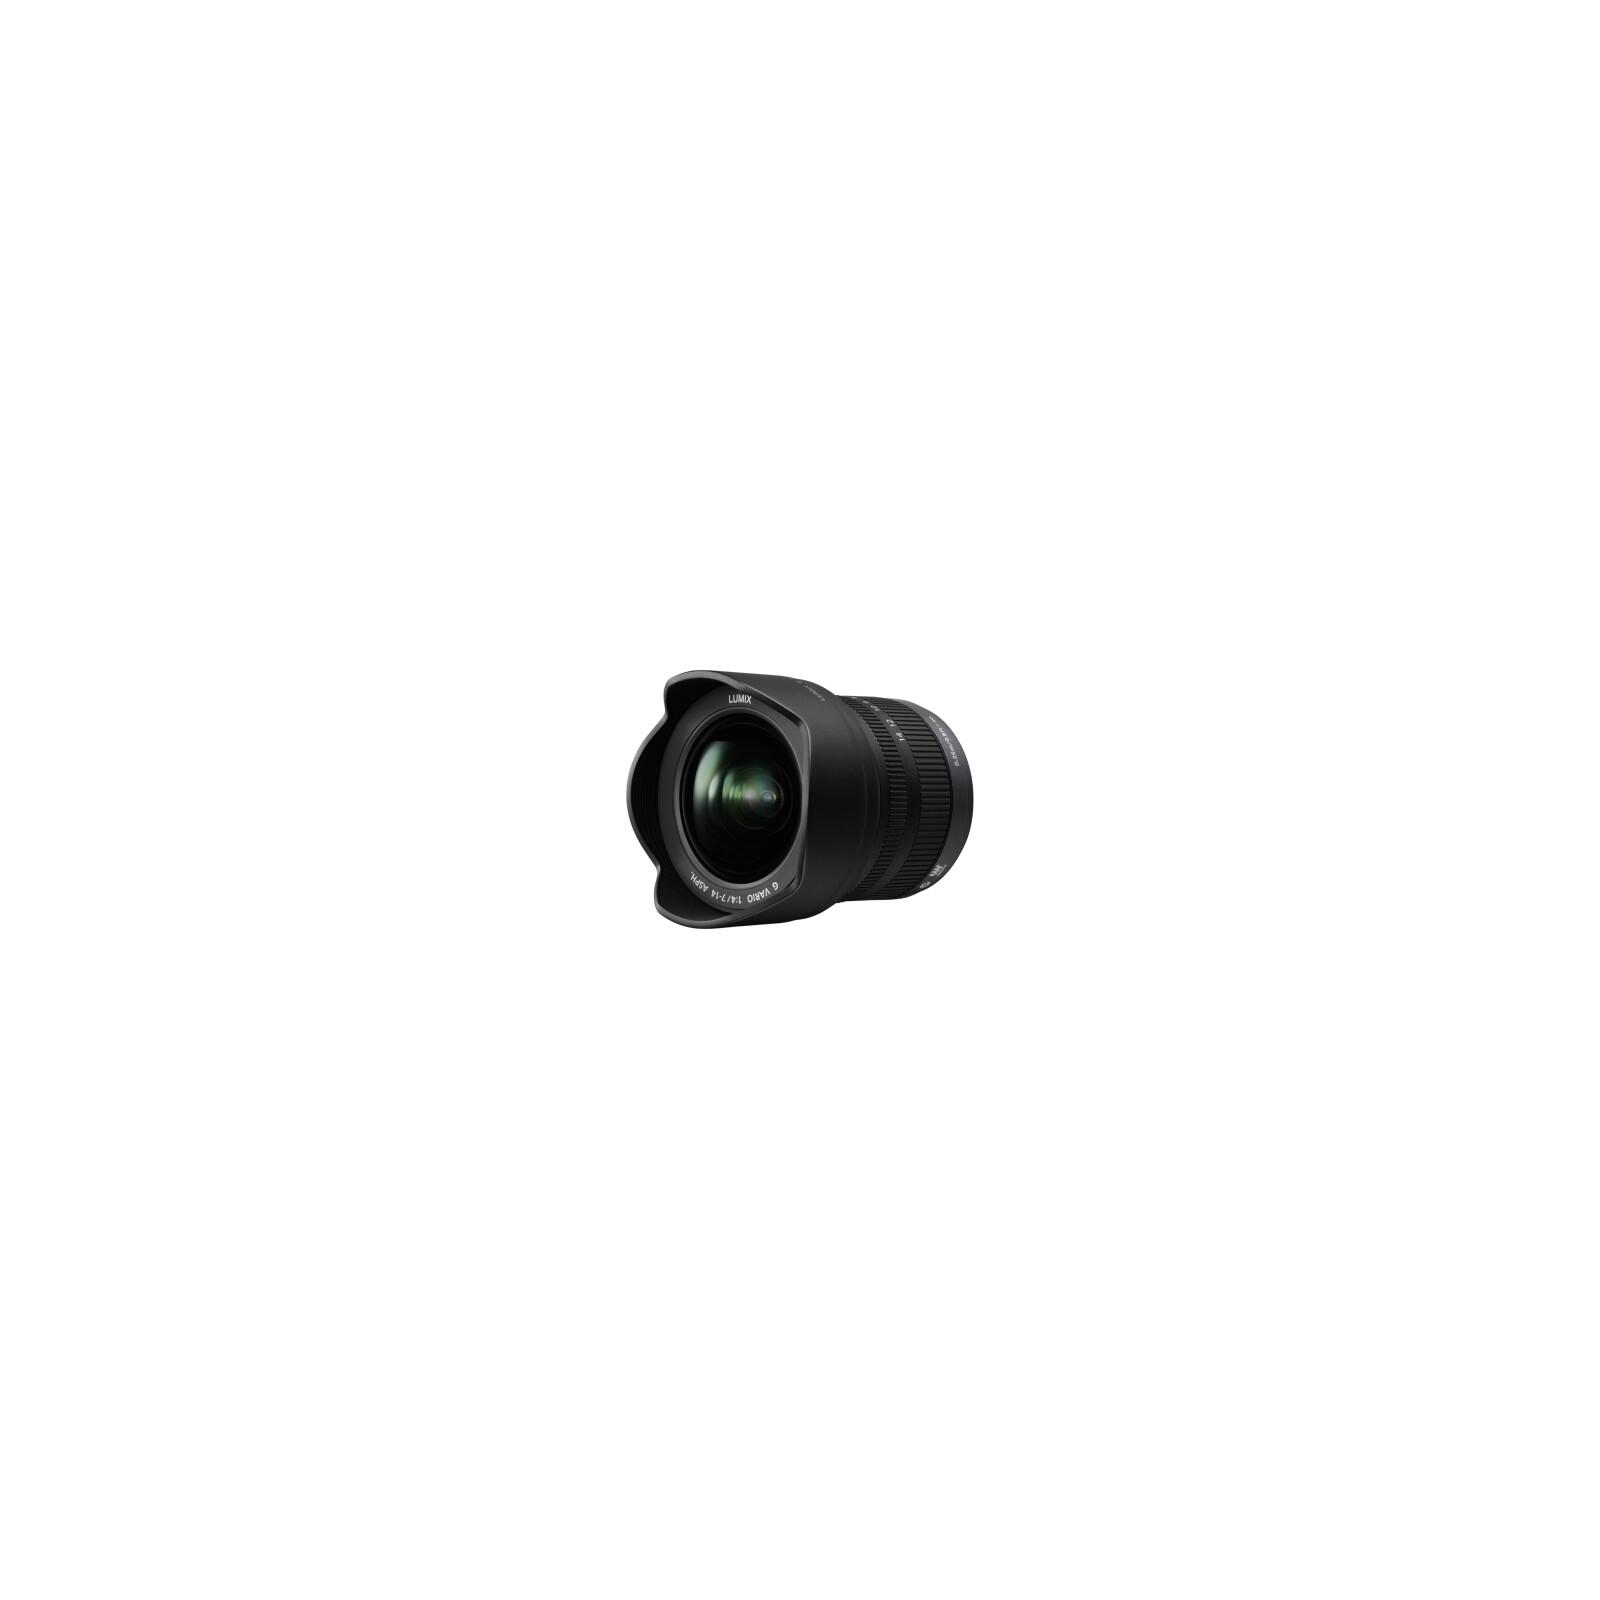 Panasonic 7-14/4,0 Lumix G Vario HD